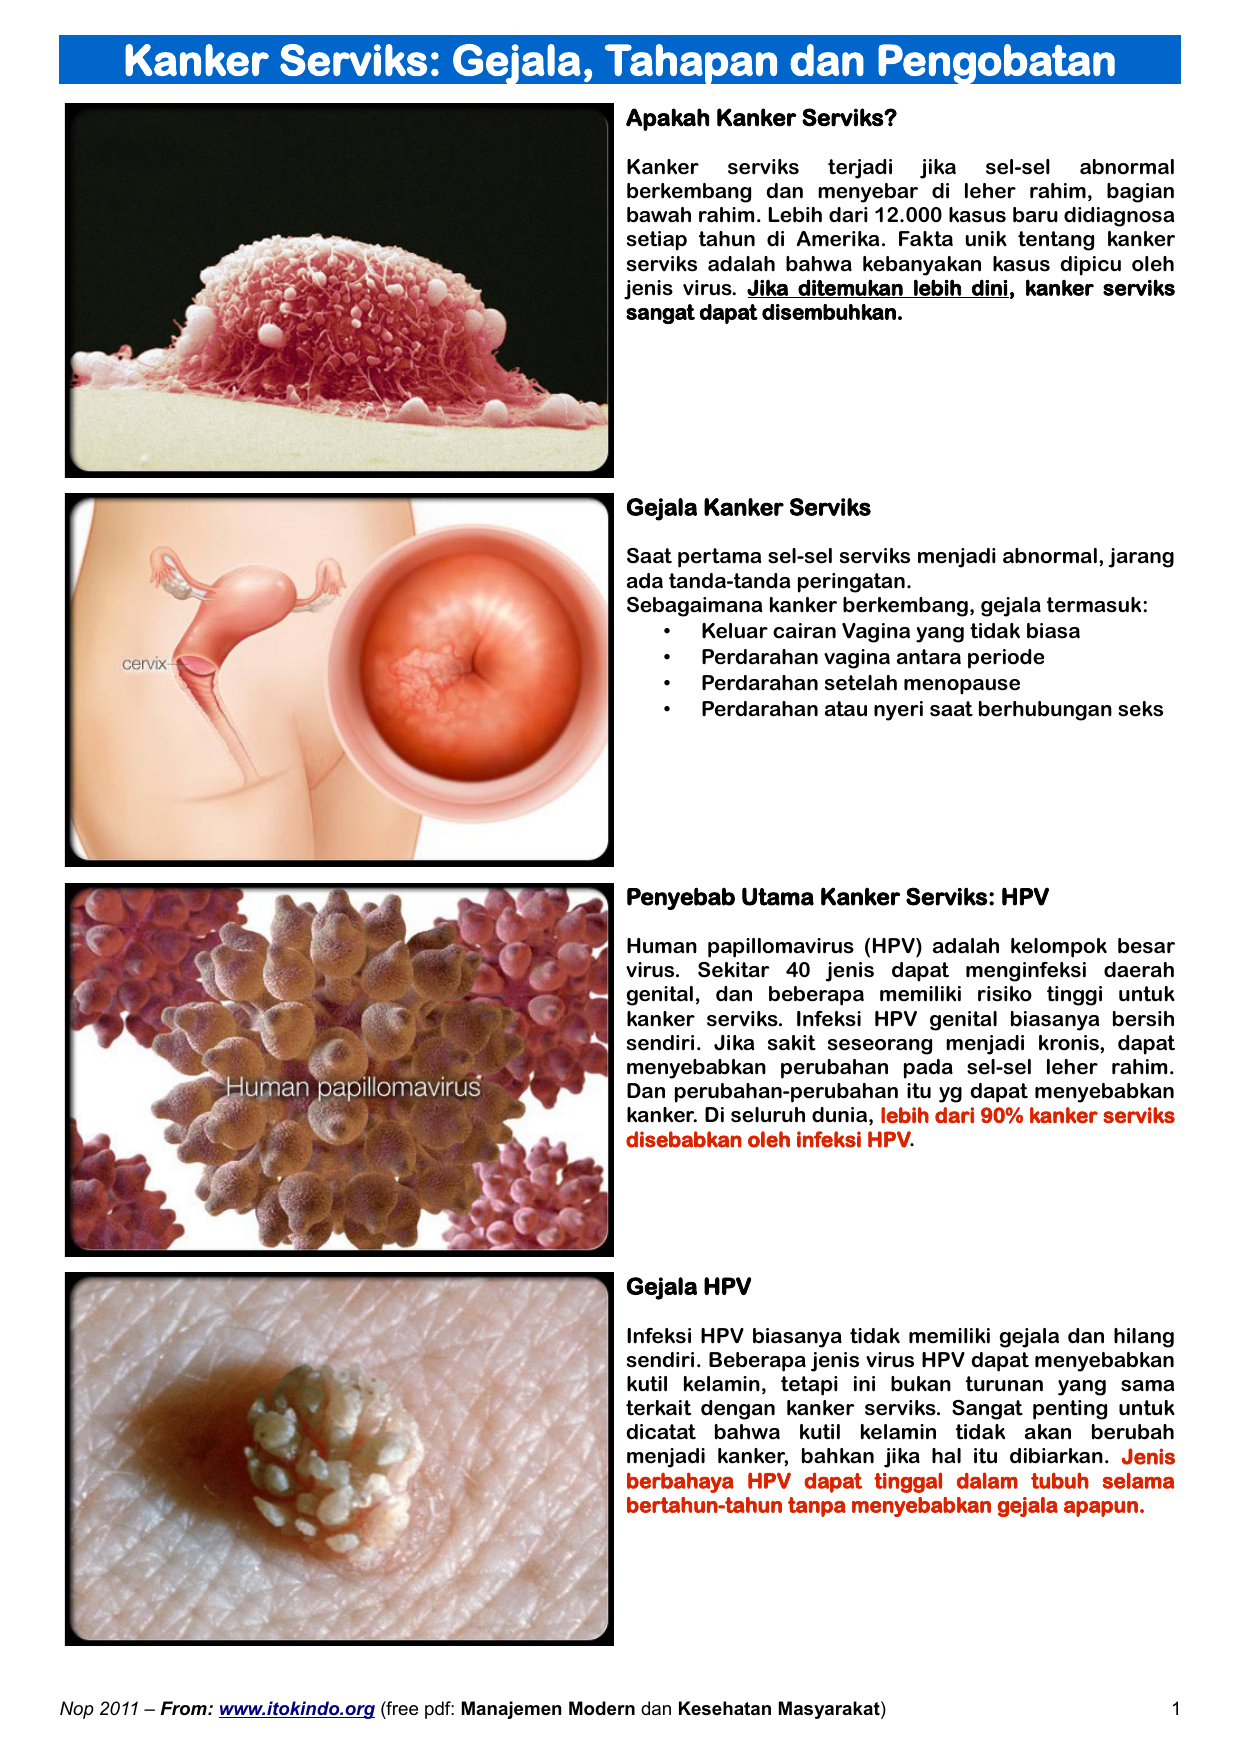 jenis hpv yang menyebabkan kanker serviks